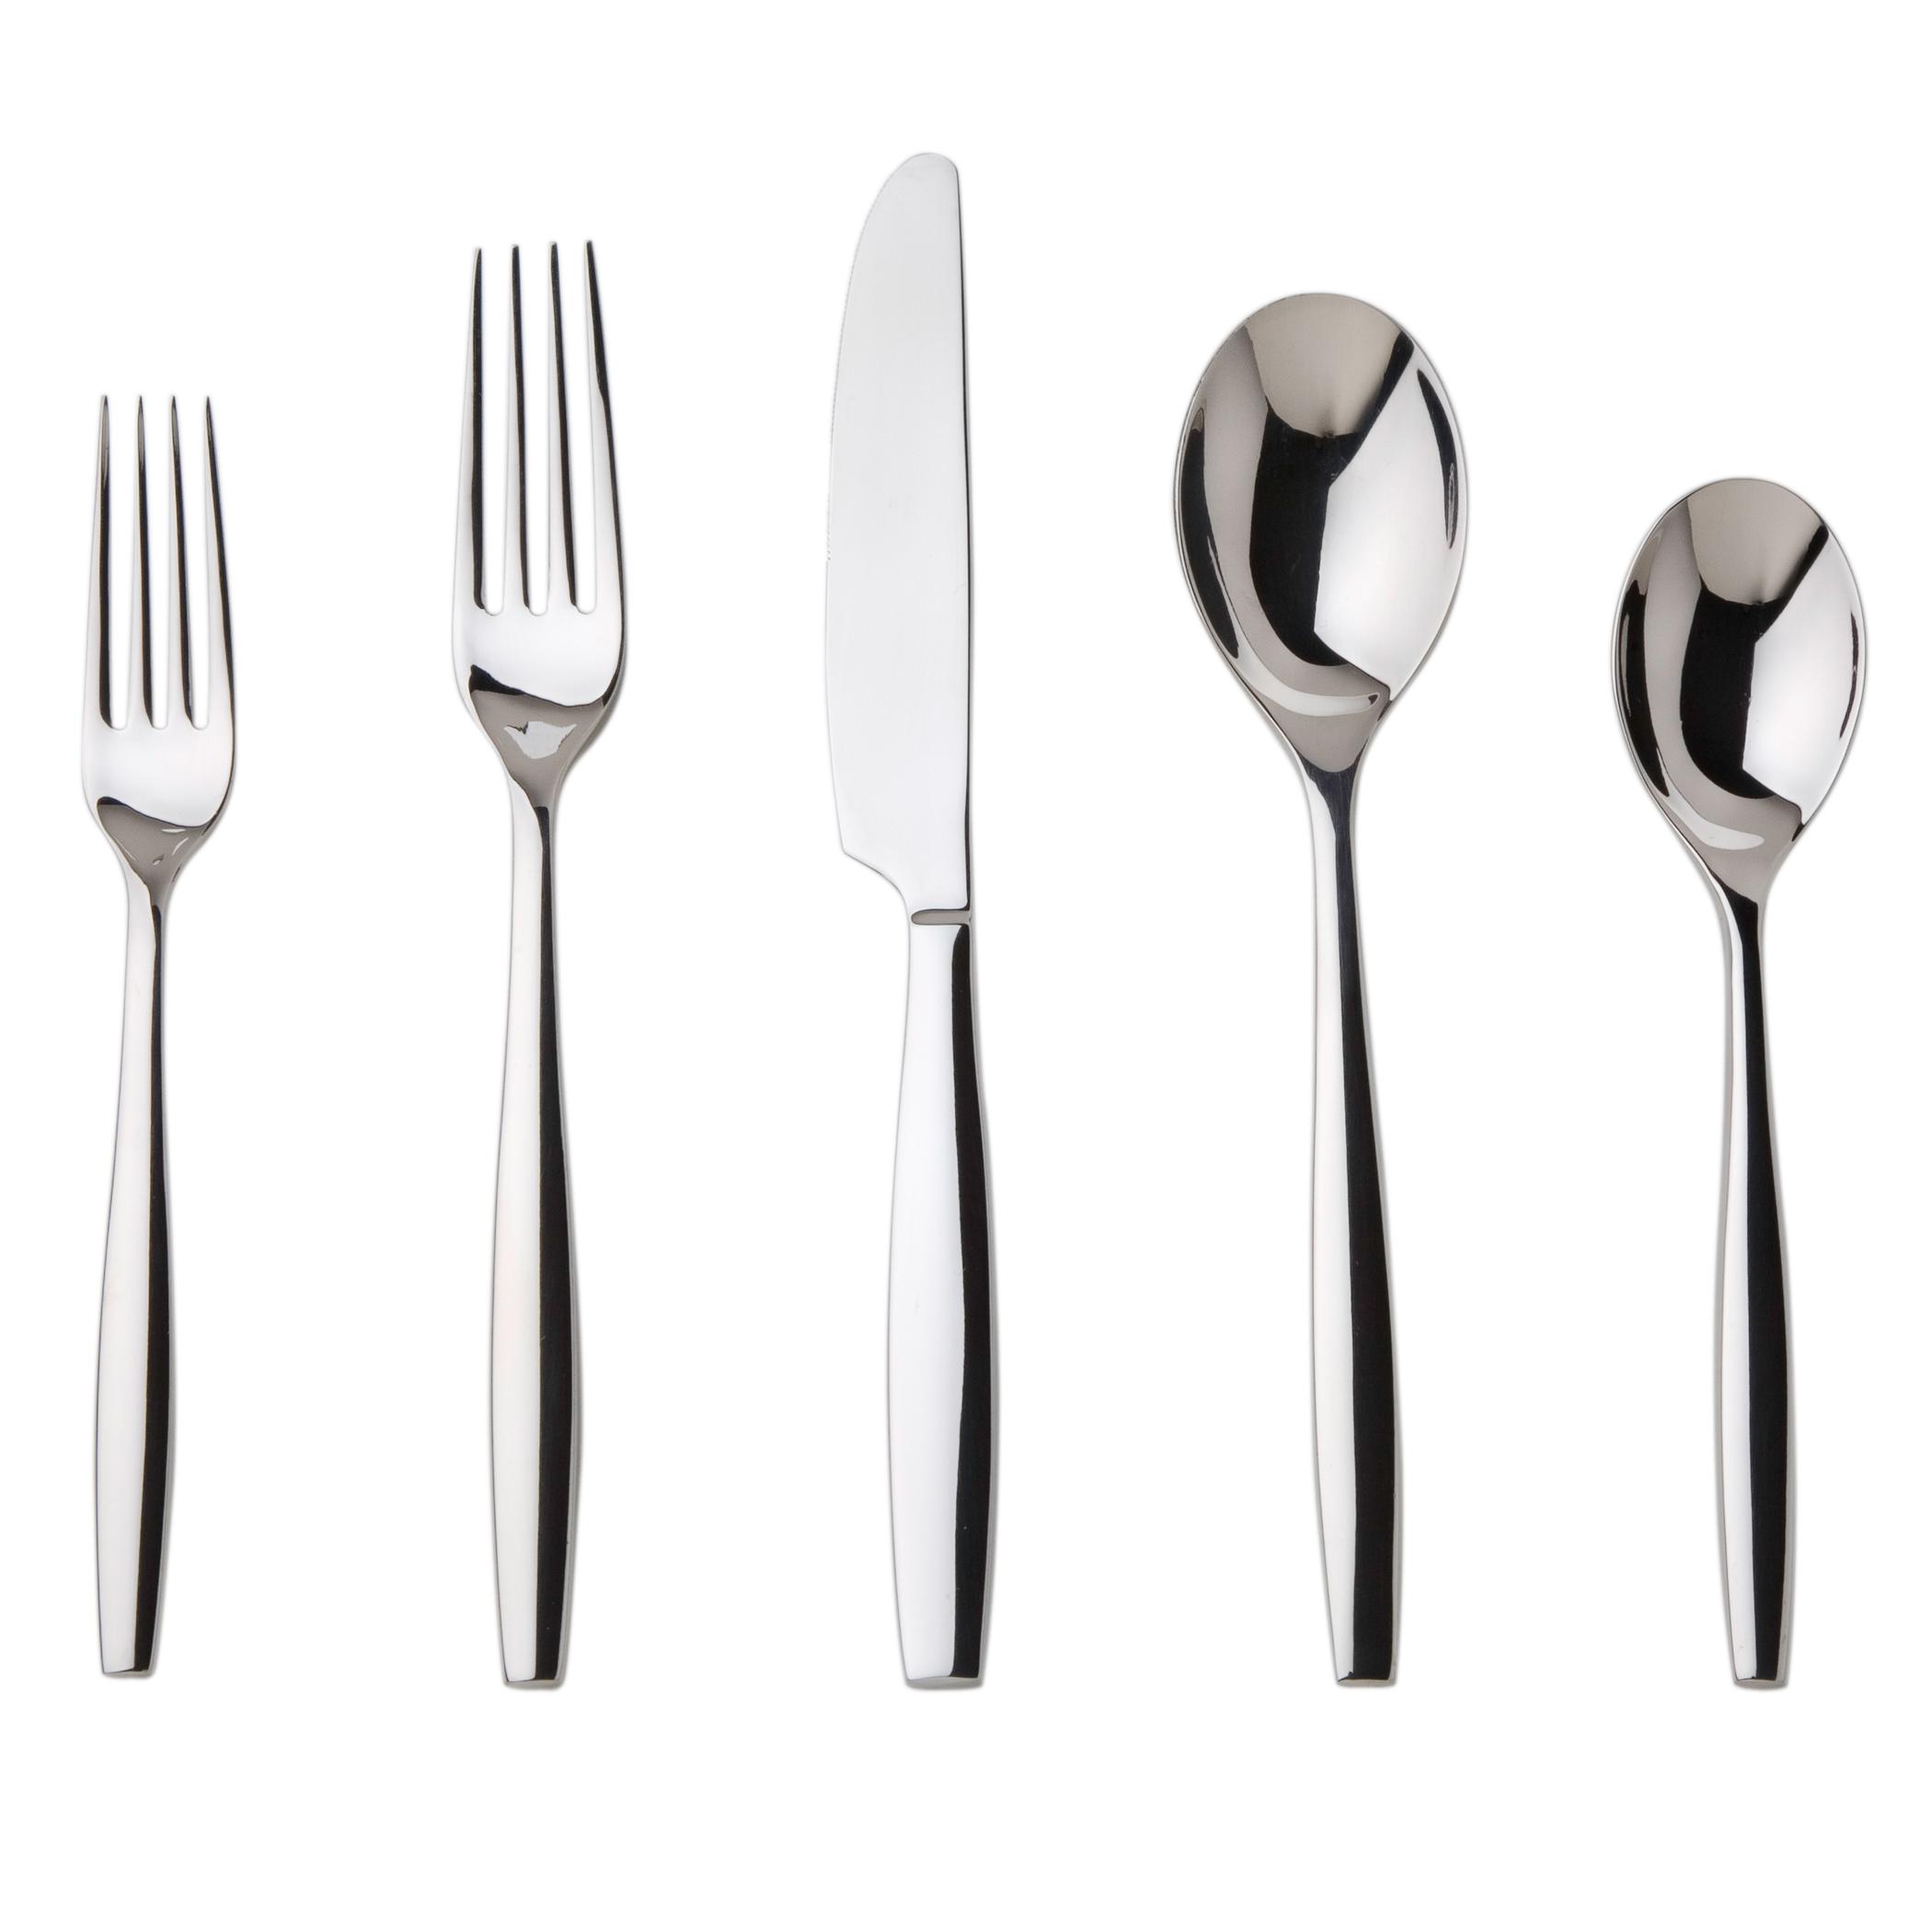 Elegant Dinner Aidan Flatware Modern Look With A Clean Design Includes